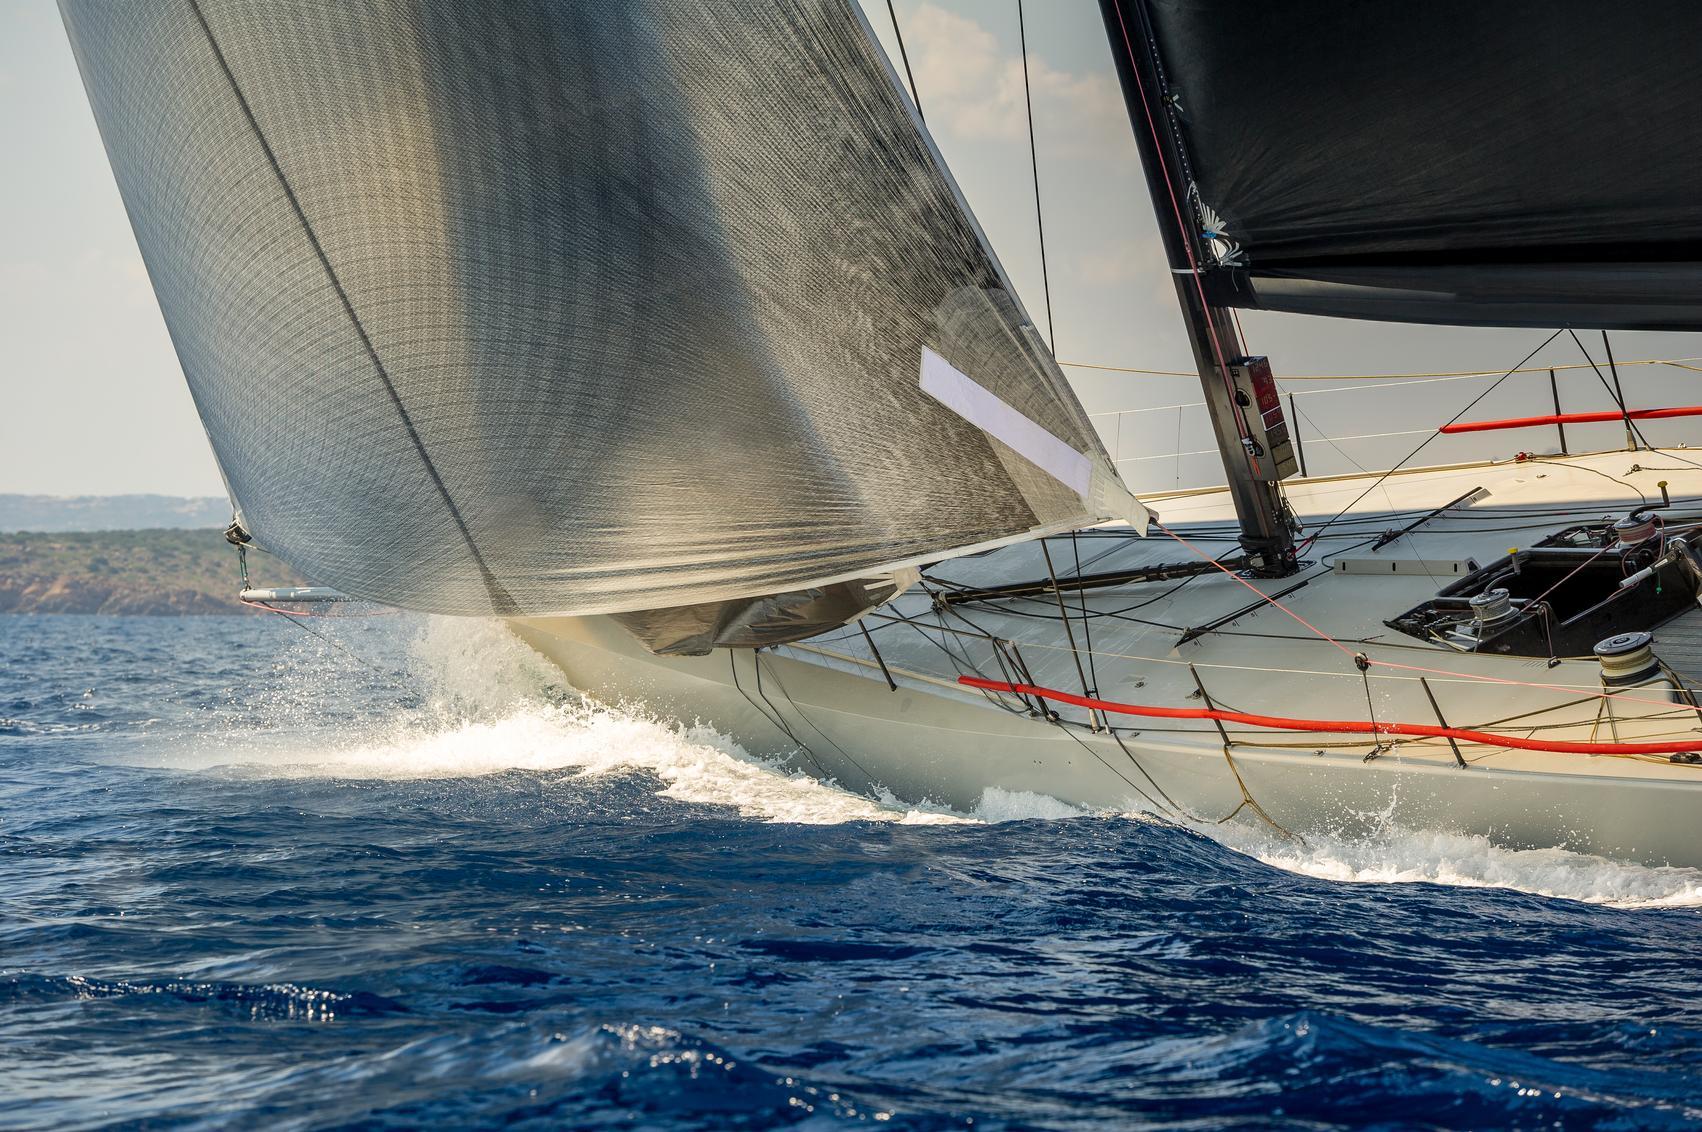 2021 Summer Sailboat Racing Season Hits Peak thumbnail